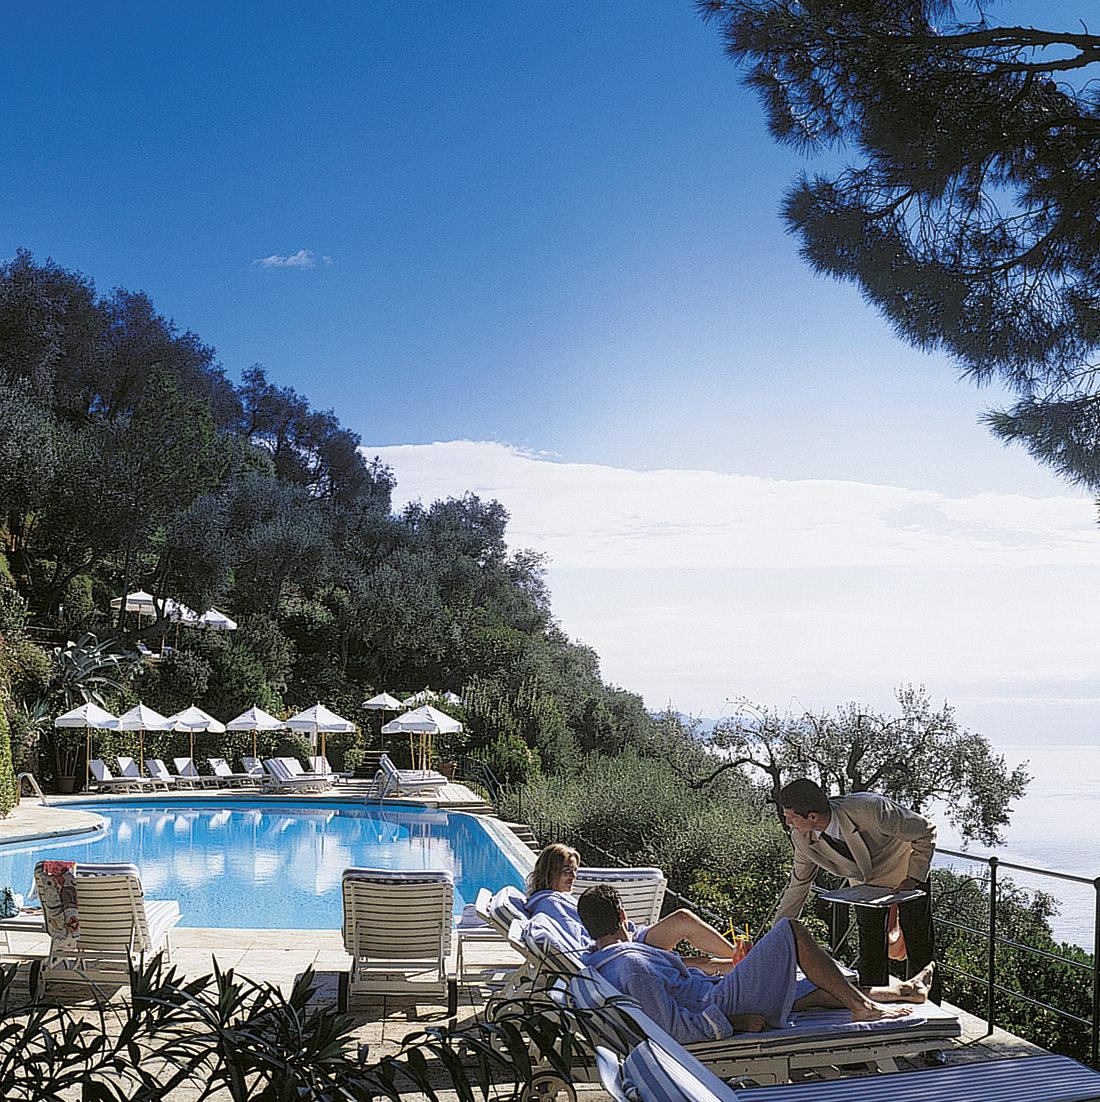 belmond-hotel-splendido-8